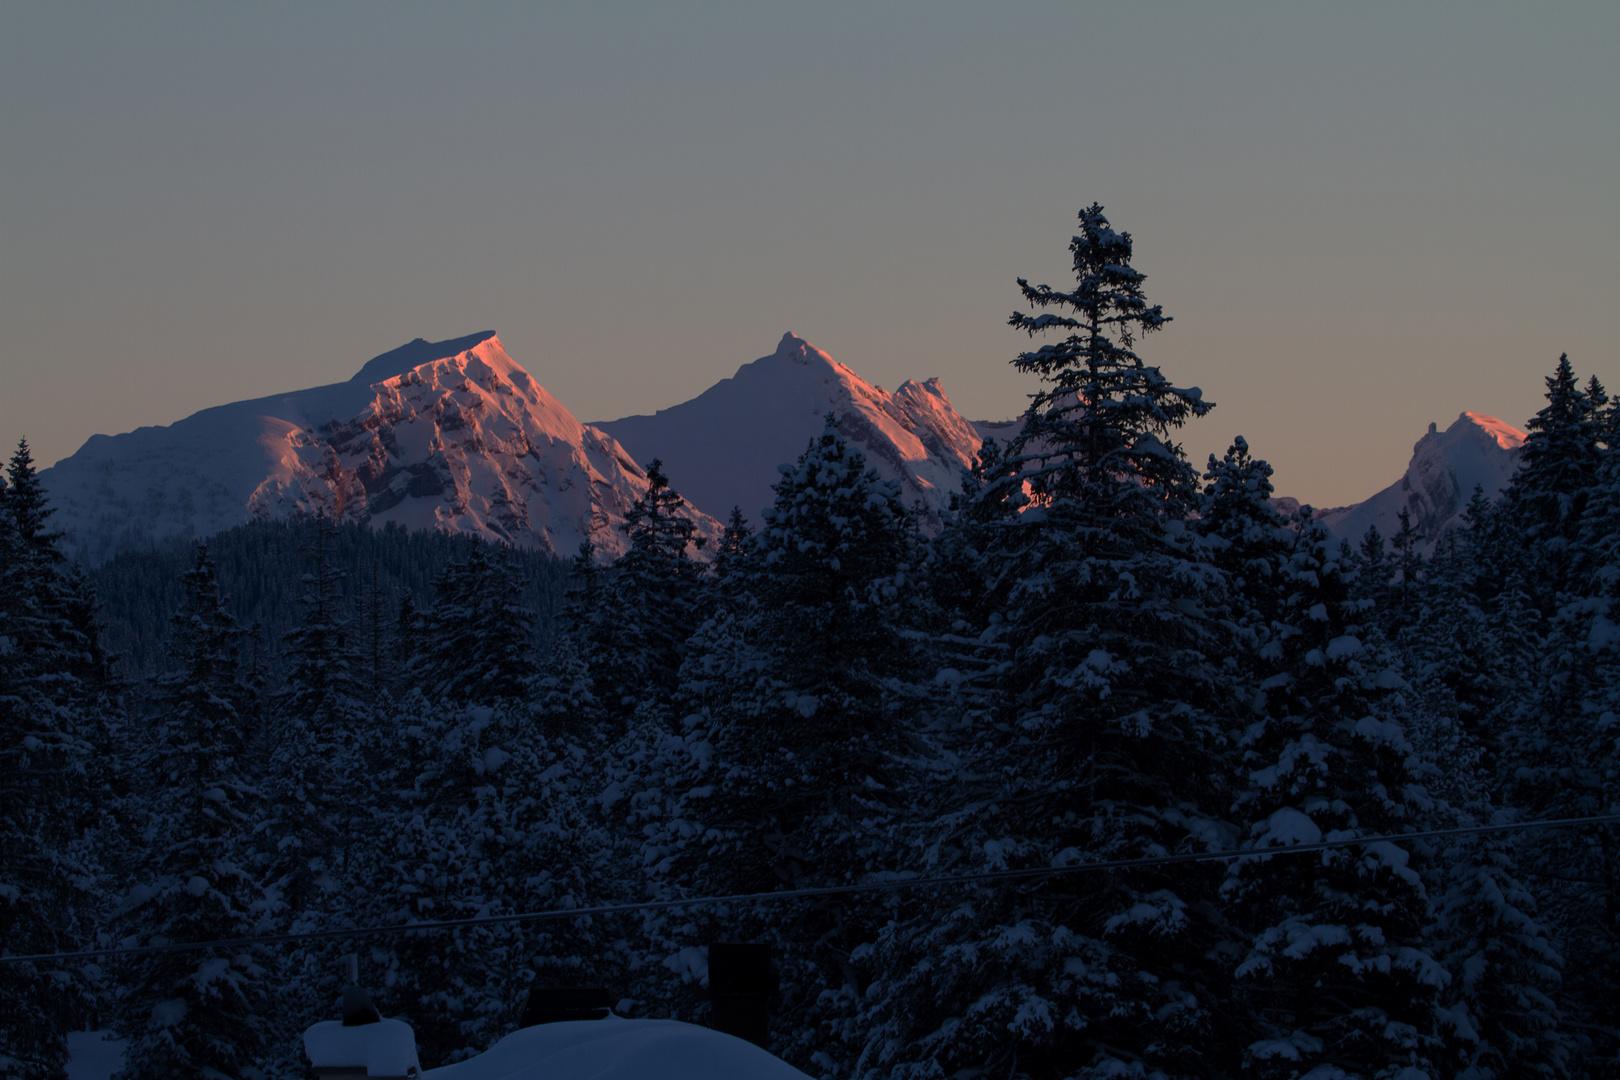 Rote Bergspitzen bei eisiger Kälte, Langis 10.02.13